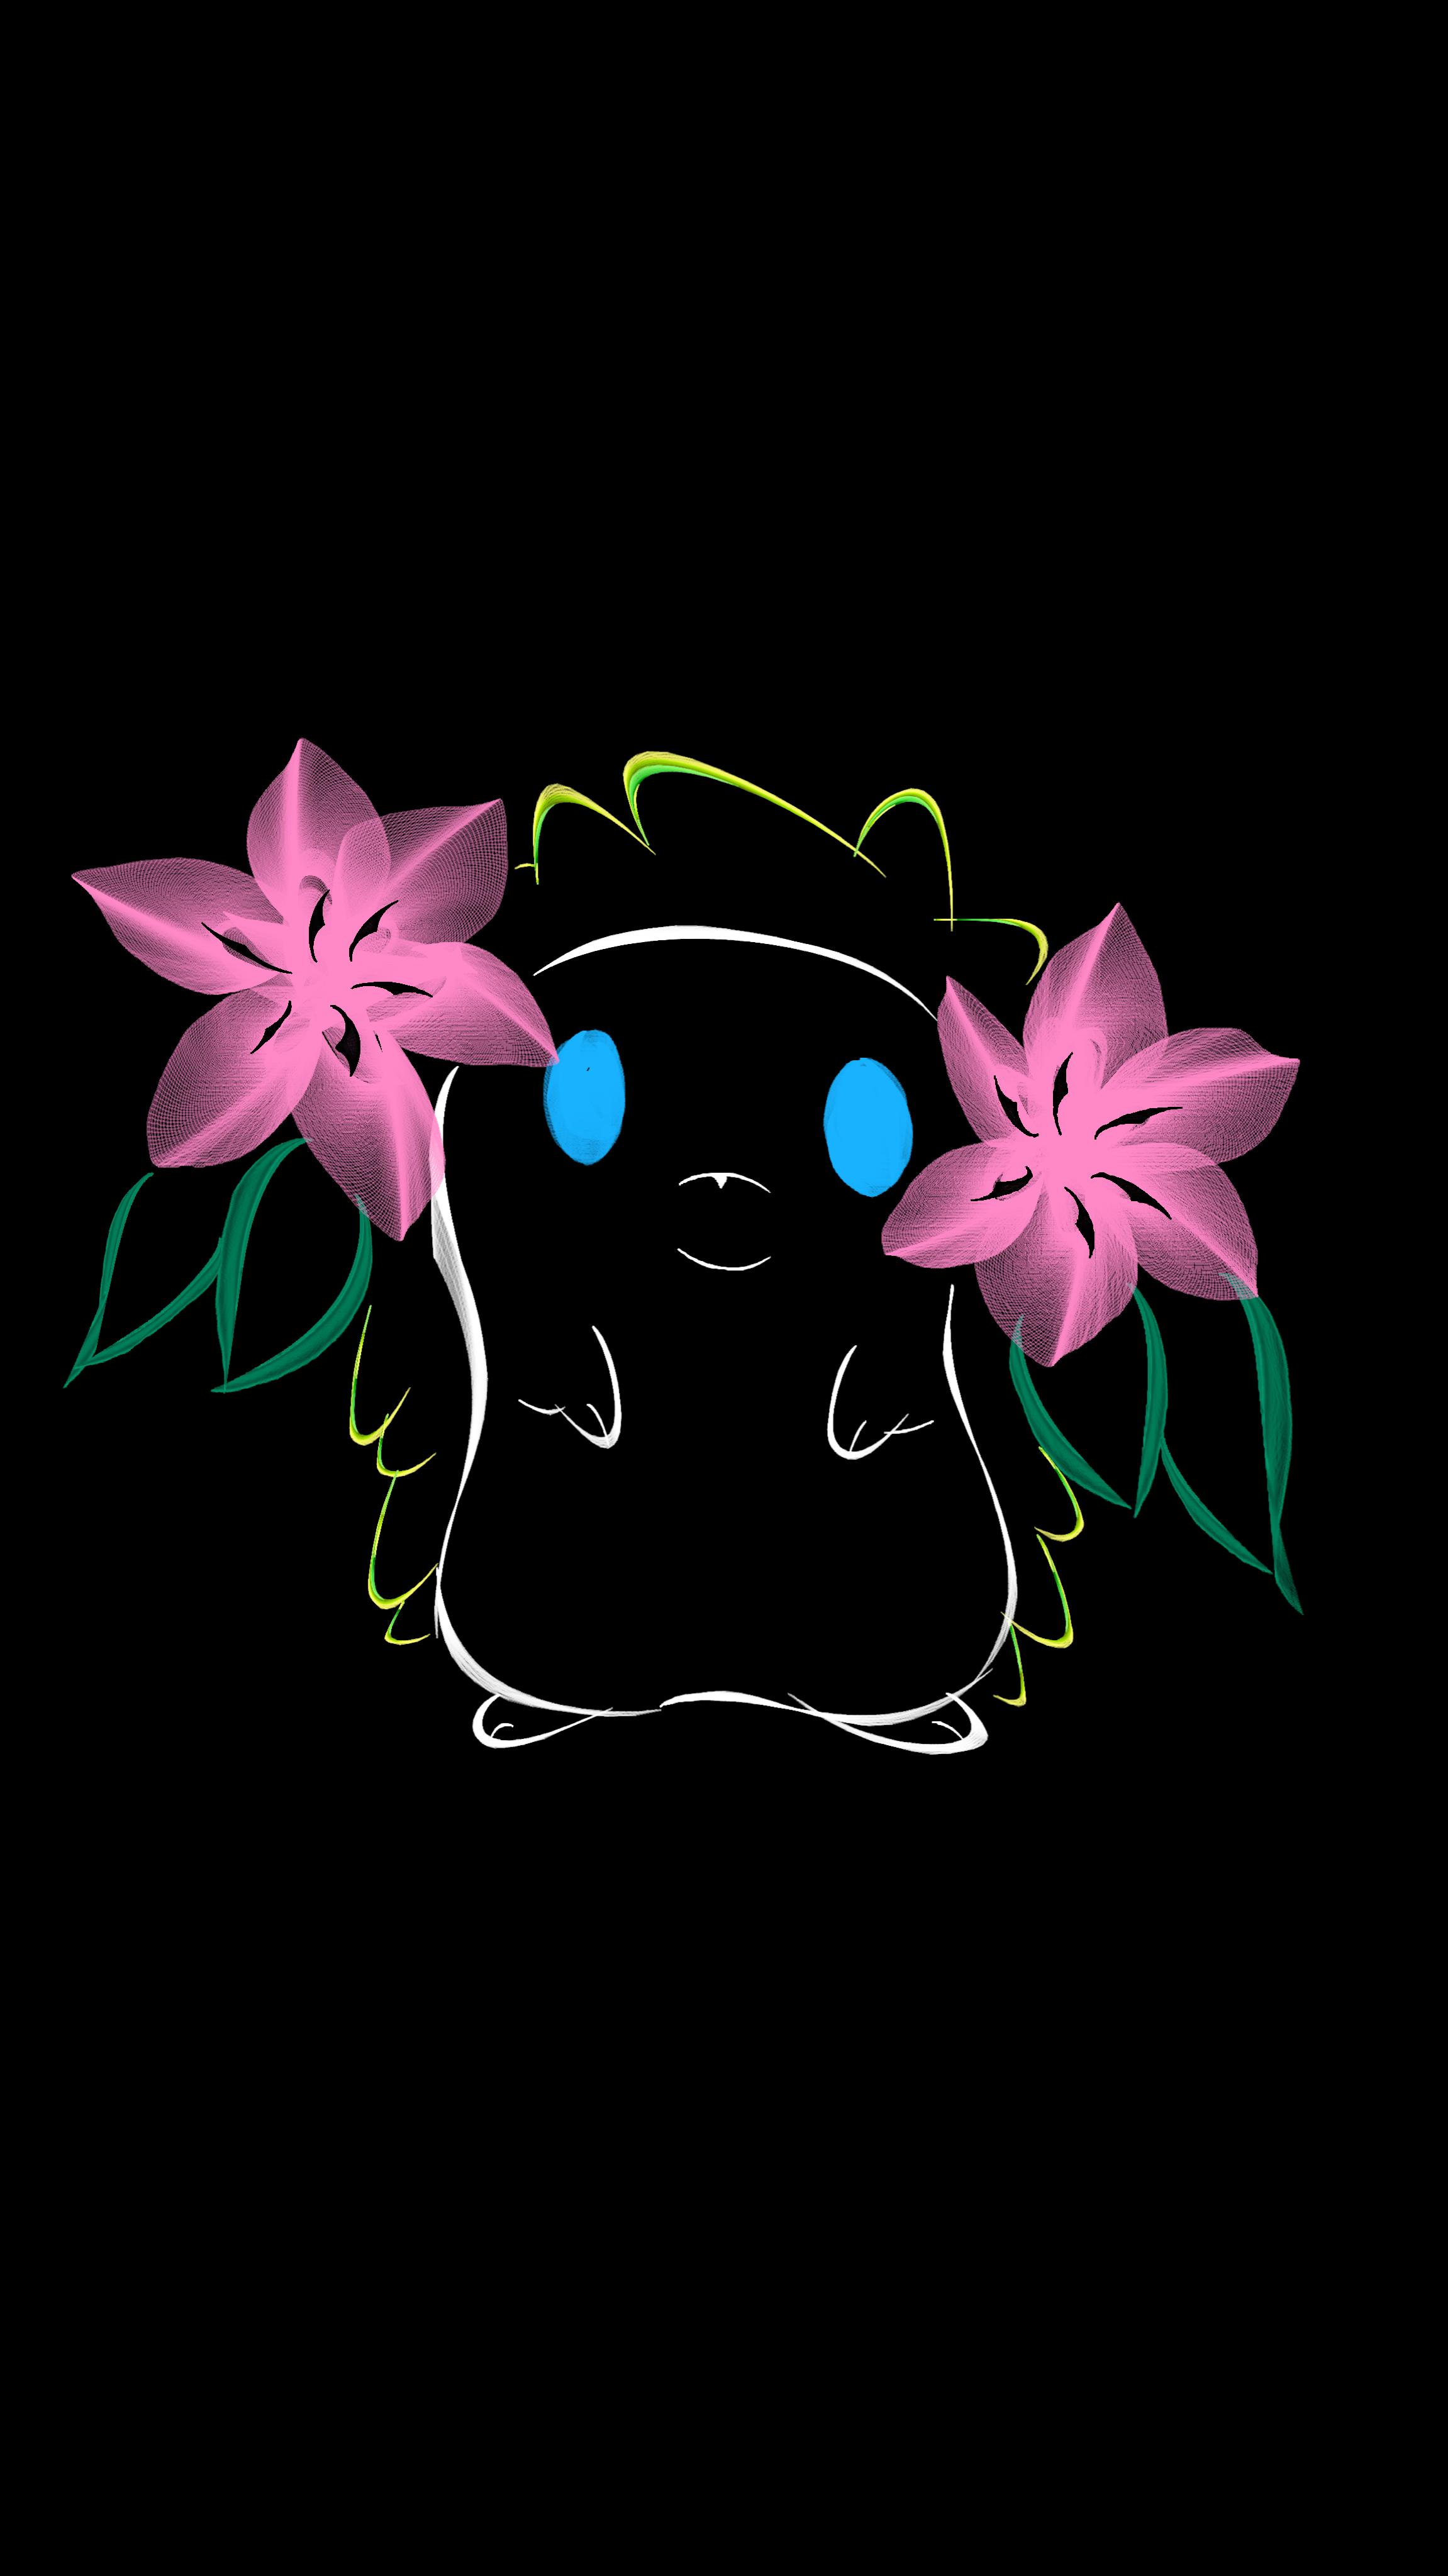 Flowpaperでランドフォルムシェイミ1 My Flowpaper Pokemon ポケモン